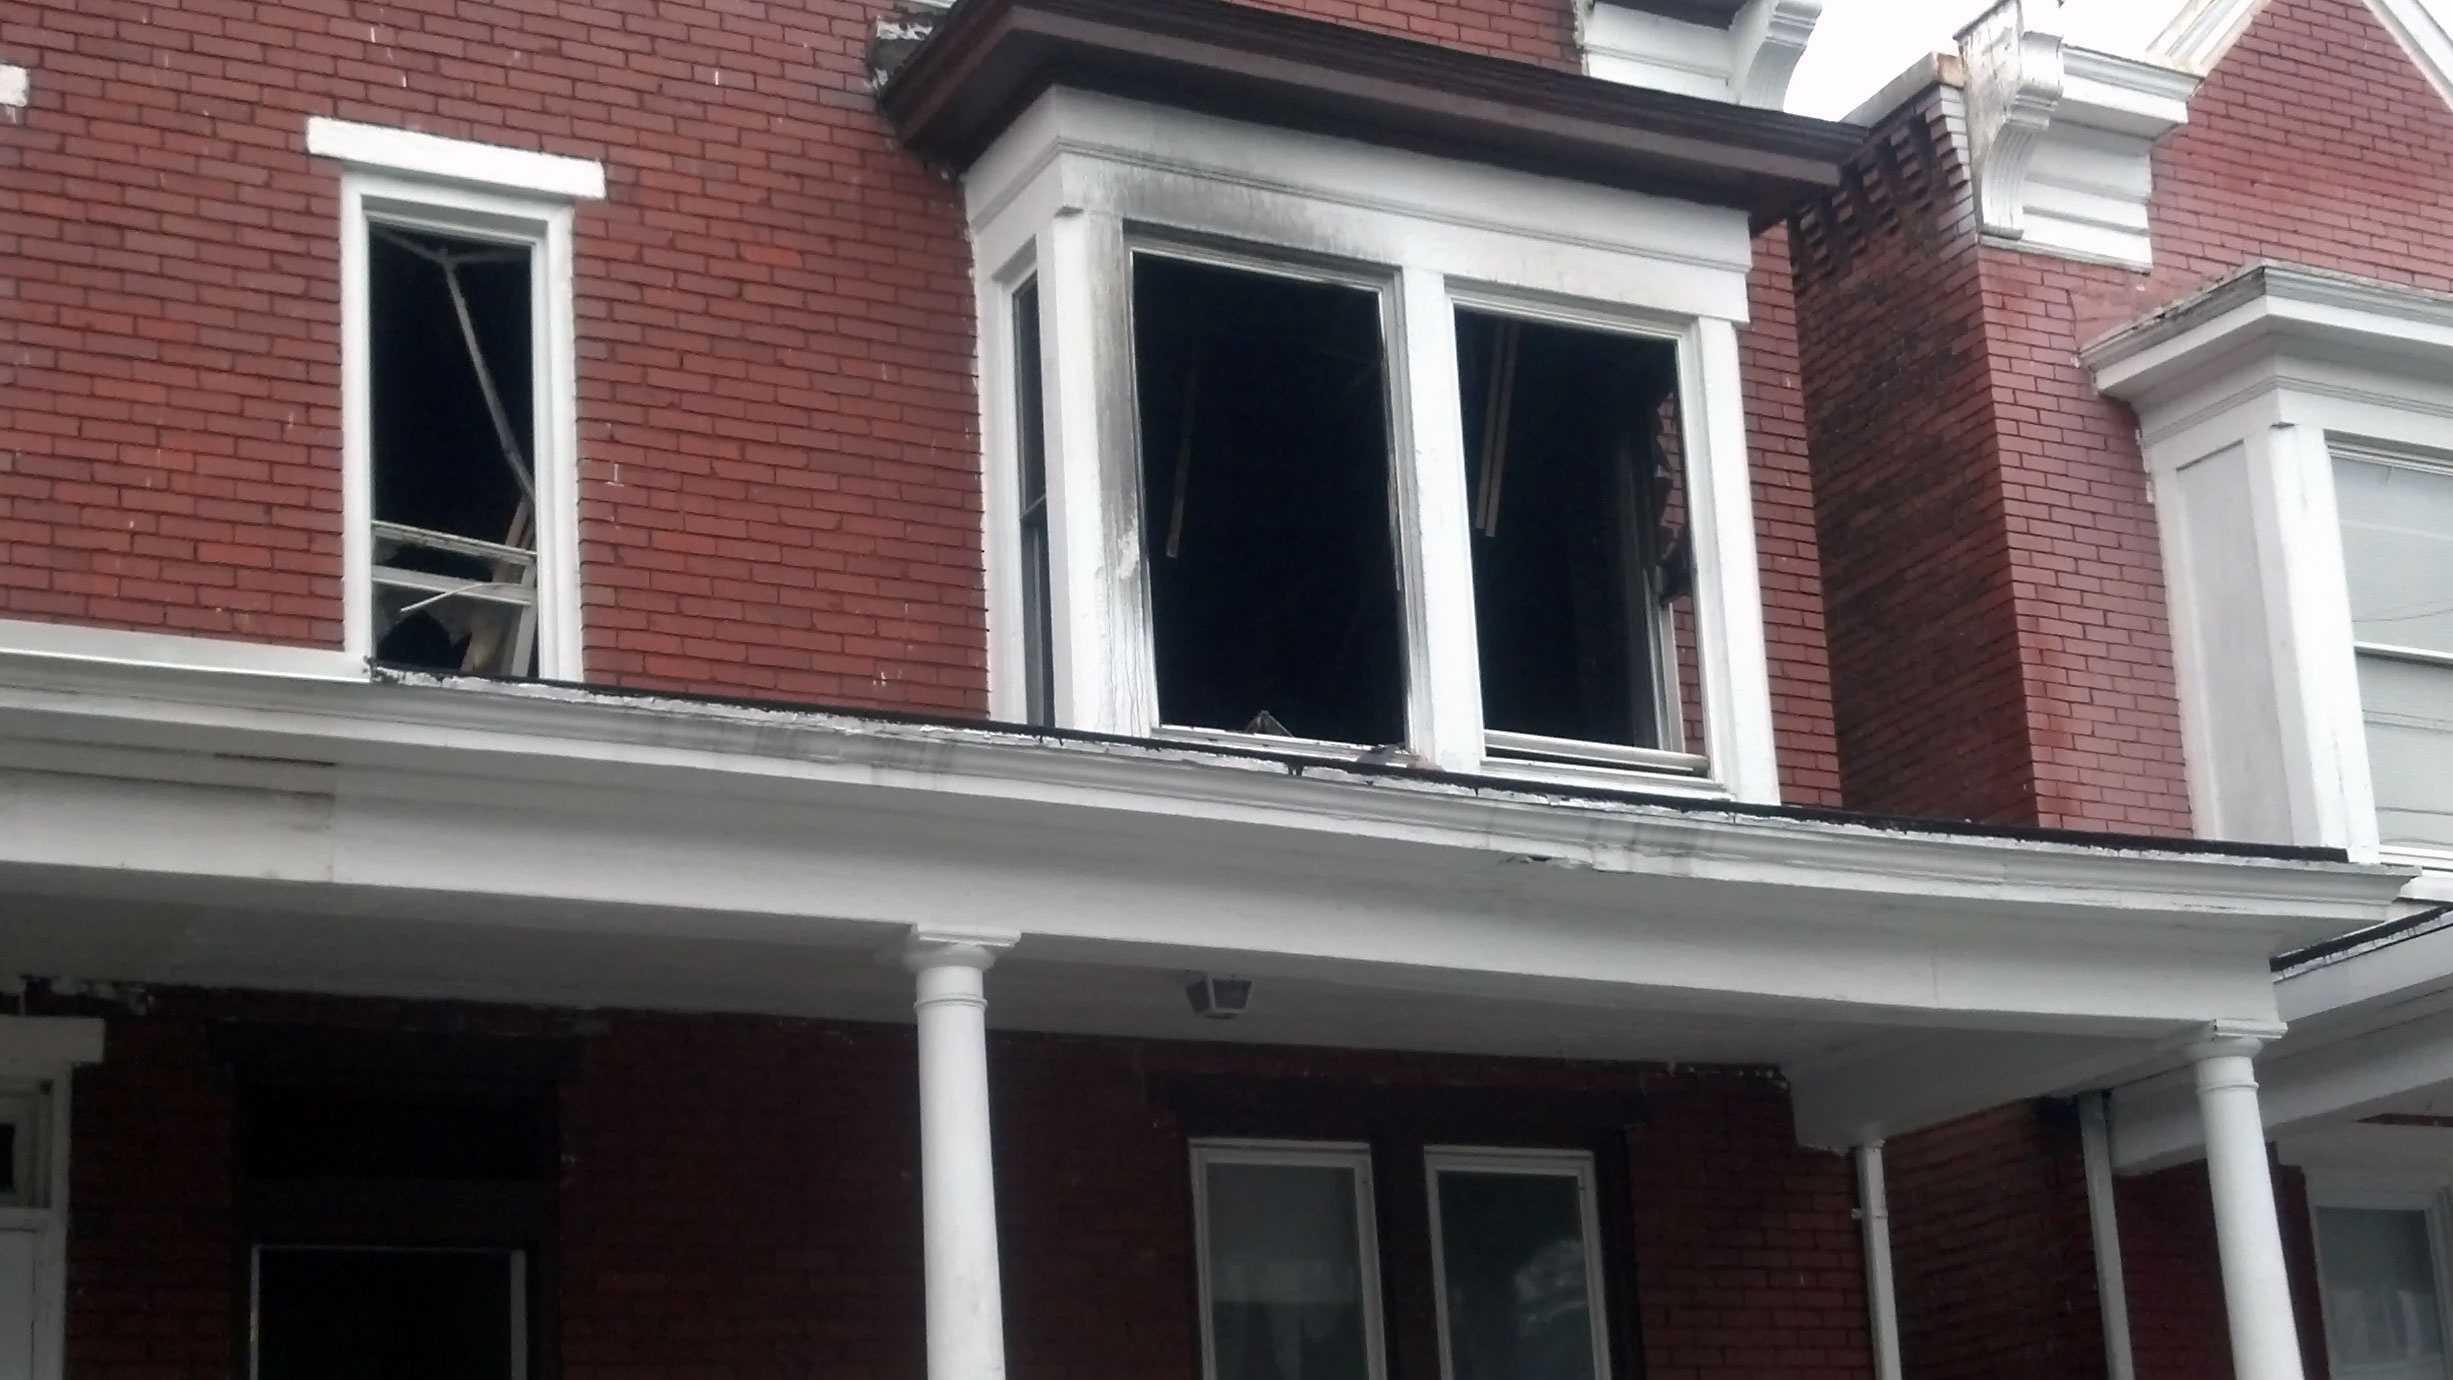 1.30 Harrisburg fire